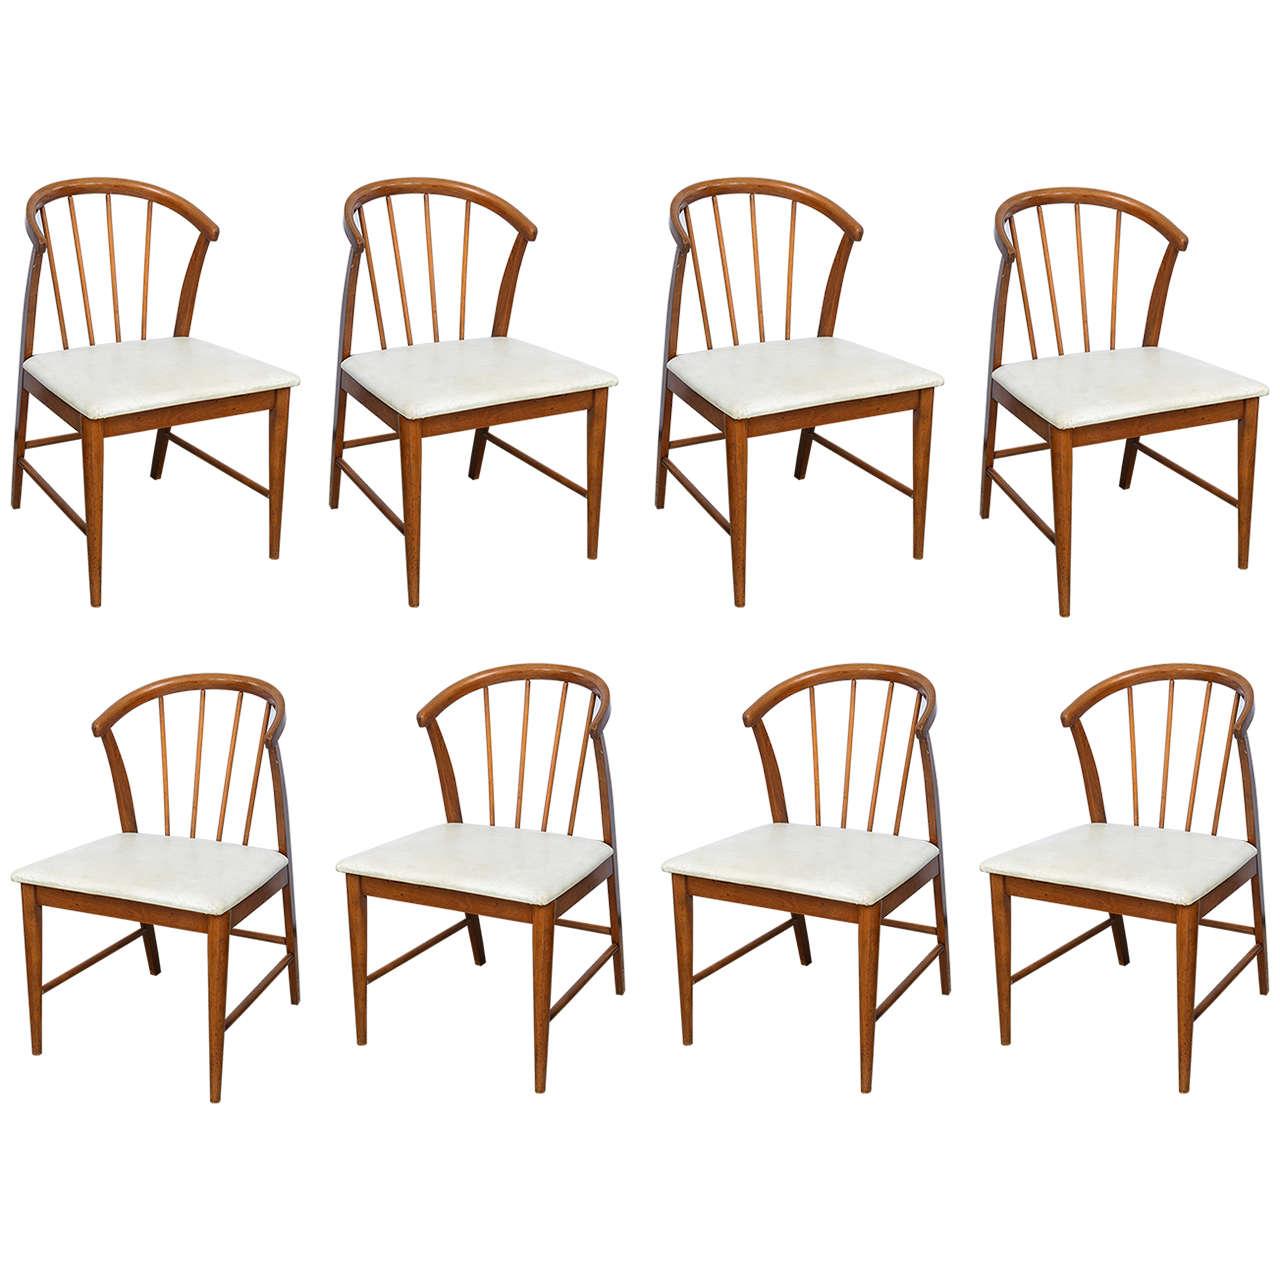 This four wishbone chairs by hans wegner is no longer available - Walnut Danish Wishbone Chairs Wegner Style 1960s At 1stdibs